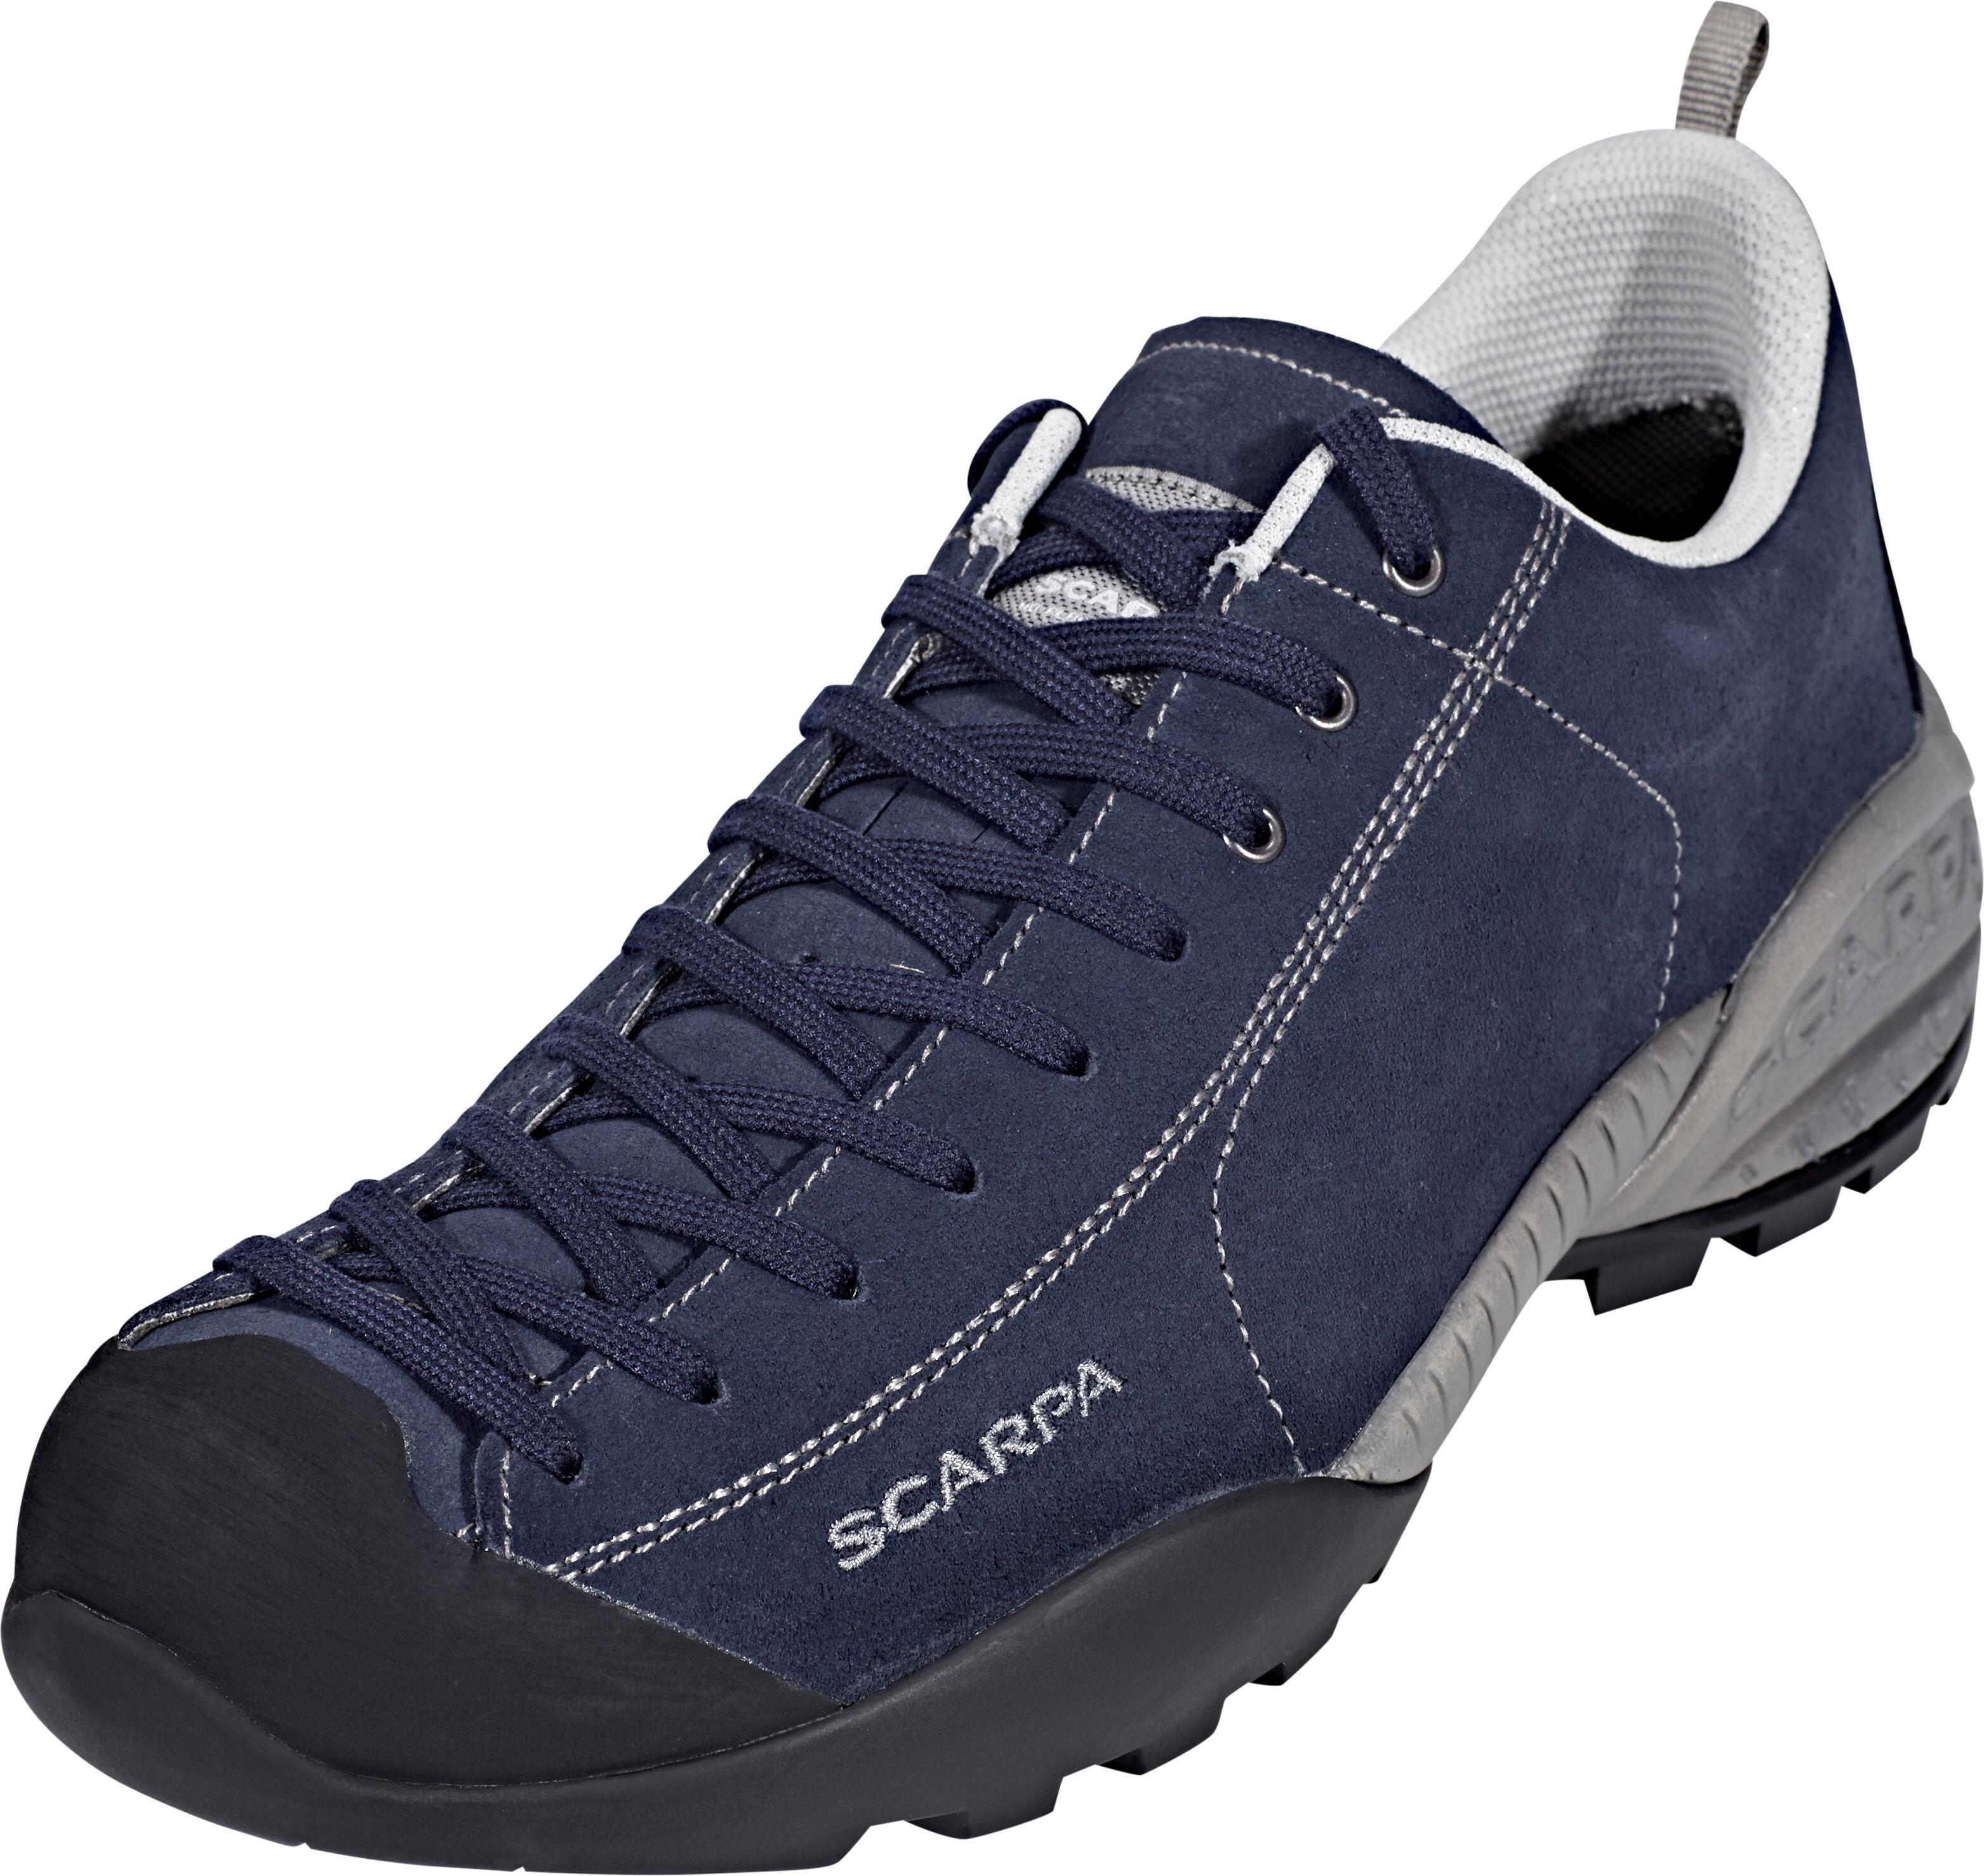 Scarpa Mojito GTX Shoes blue at Addnature.co.uk 7b0e99e91e6